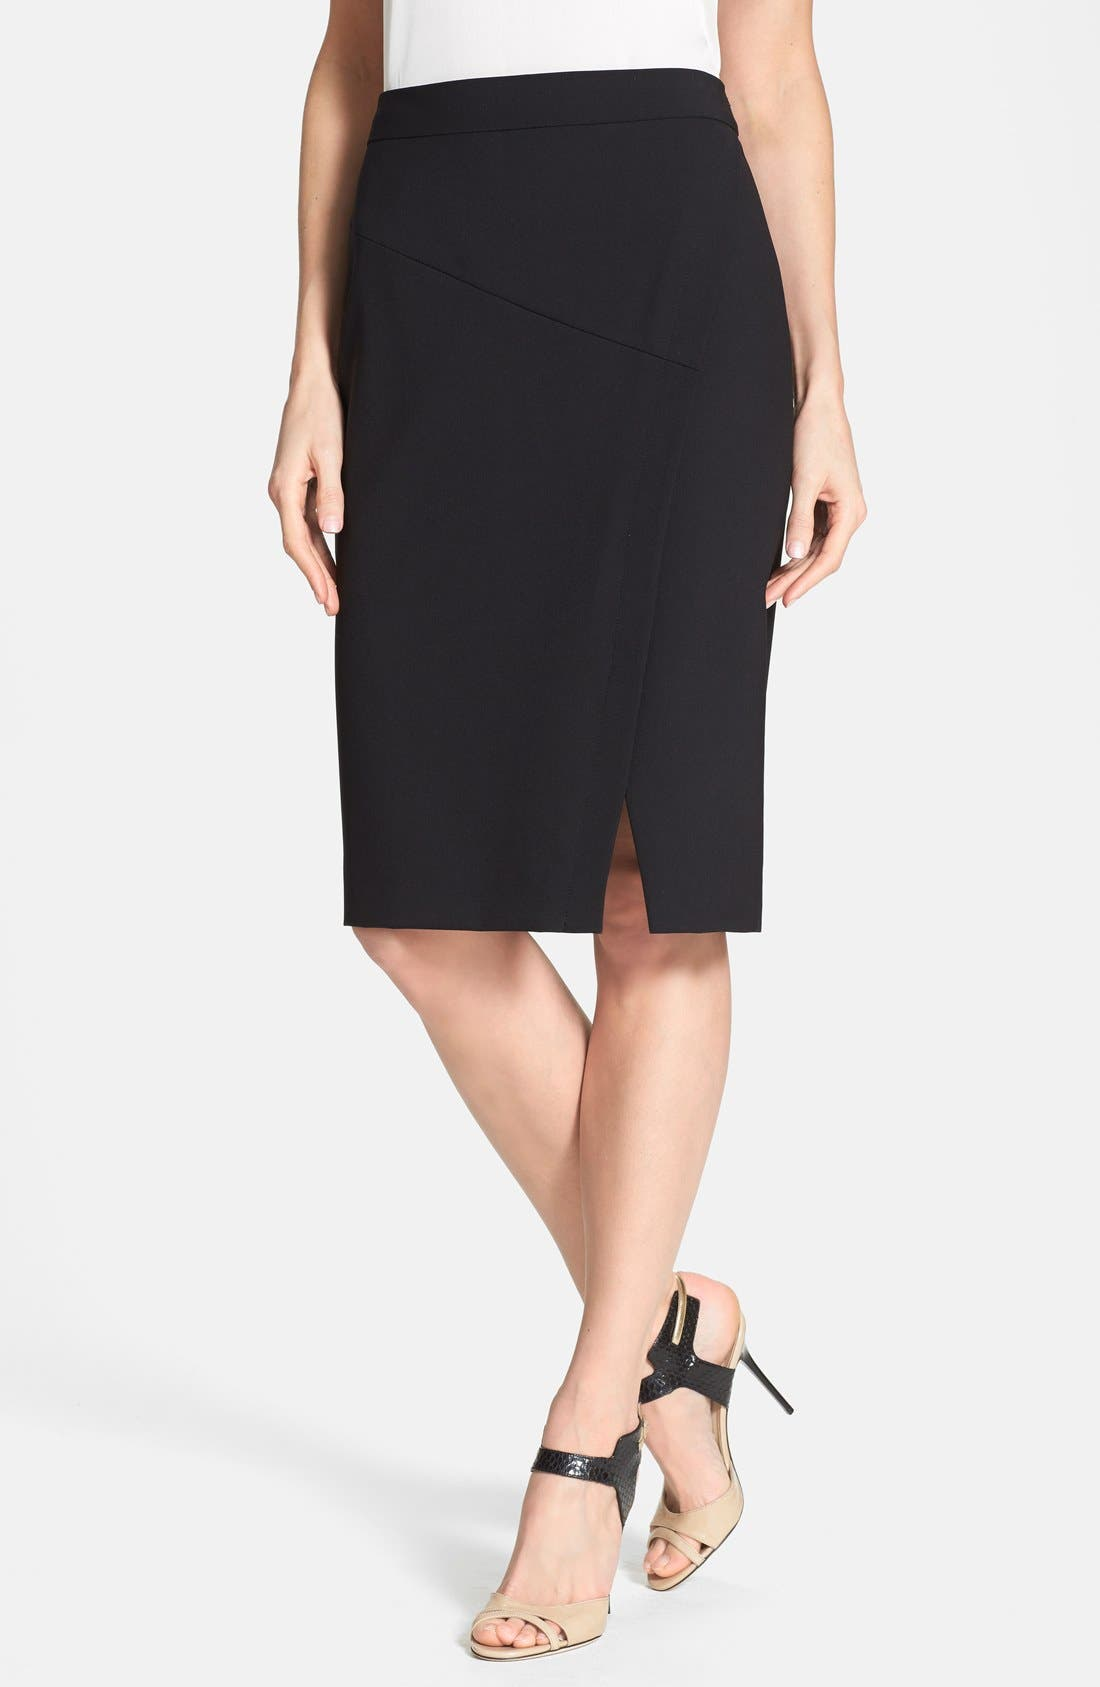 Alternate Image 1 Selected - Classiques Entier® 'Jolie' Diagonal Seam Stretch Skirt